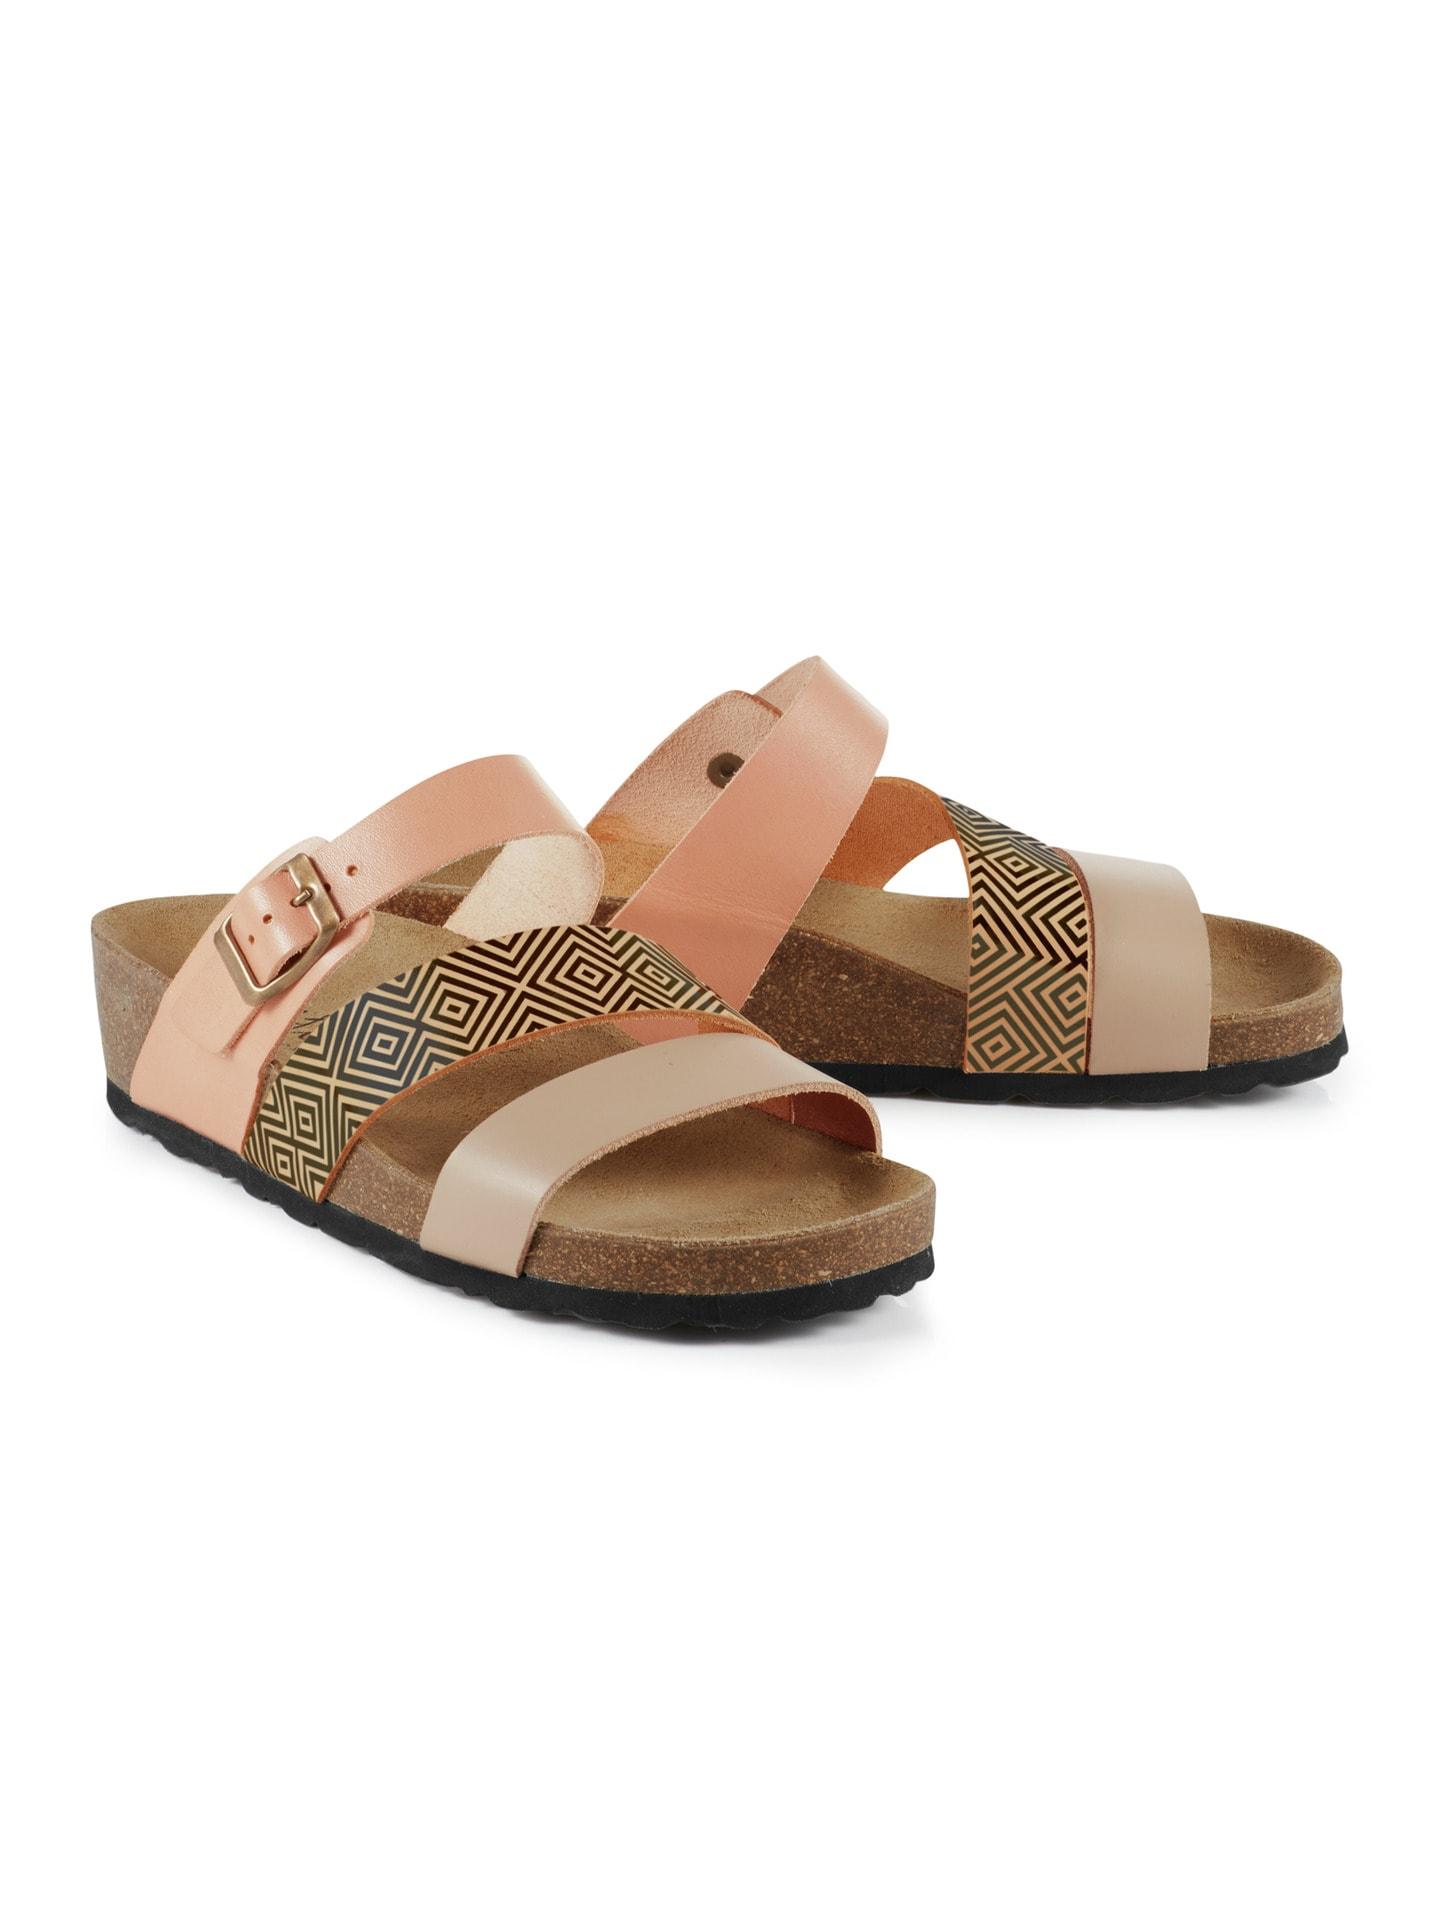 Image of Comfort-Sandale